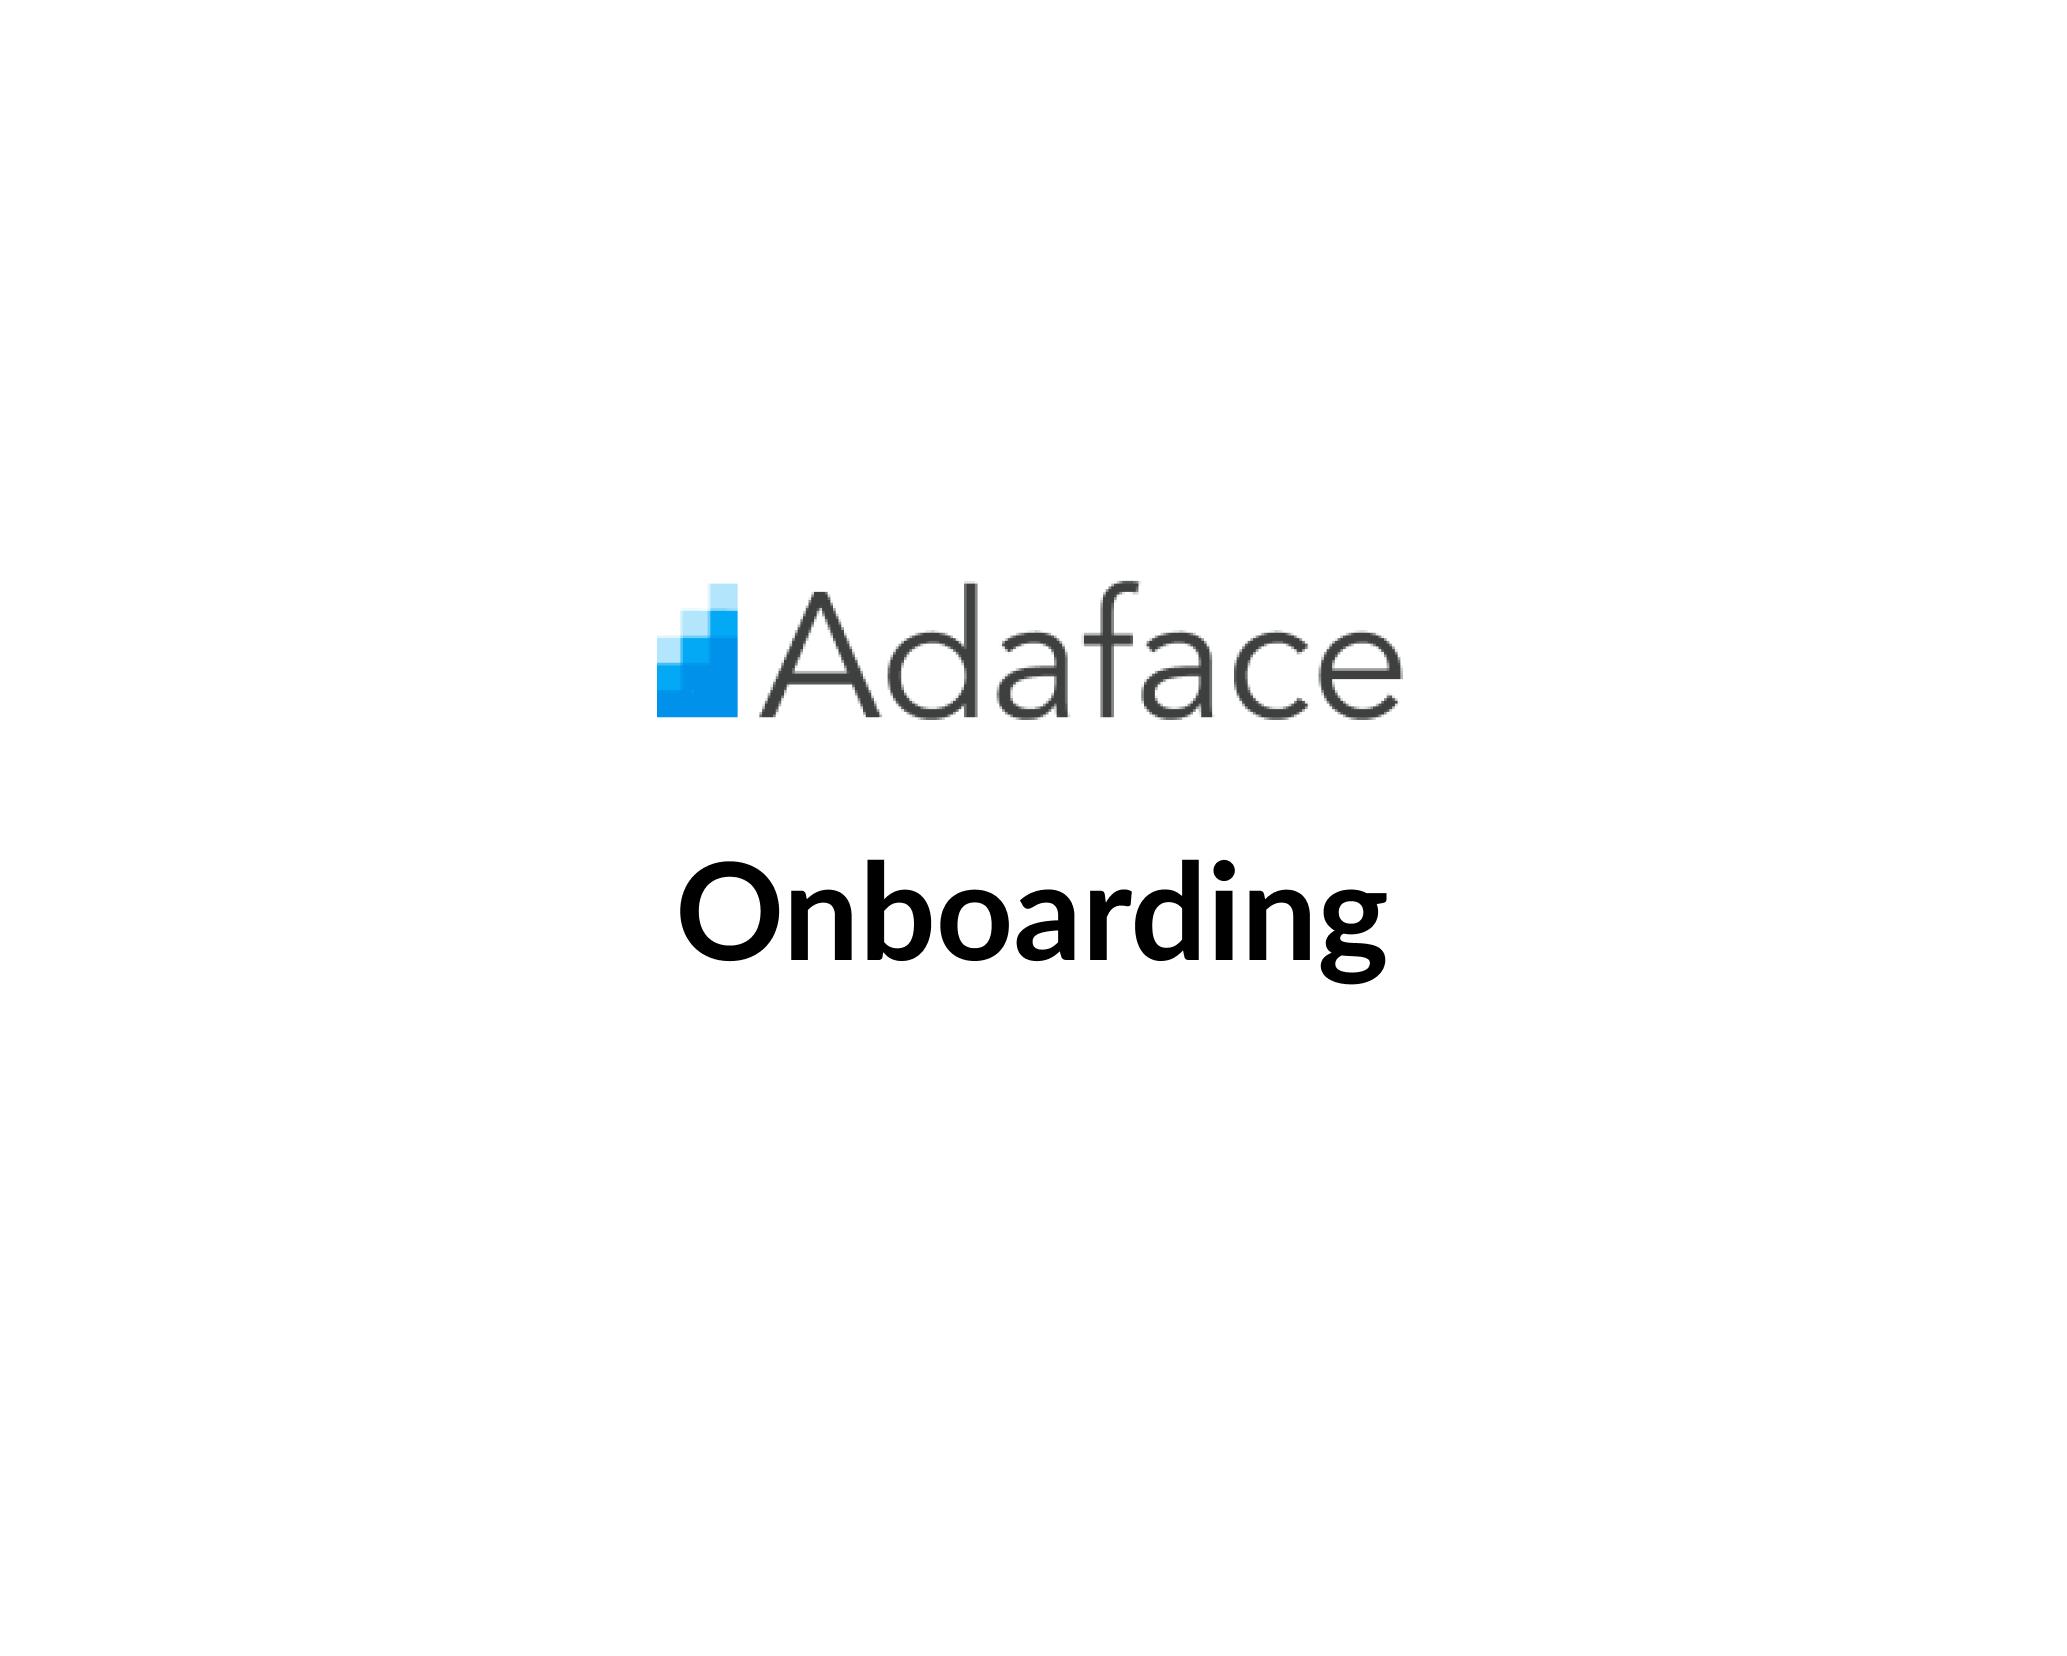 Adaface Onboarding image